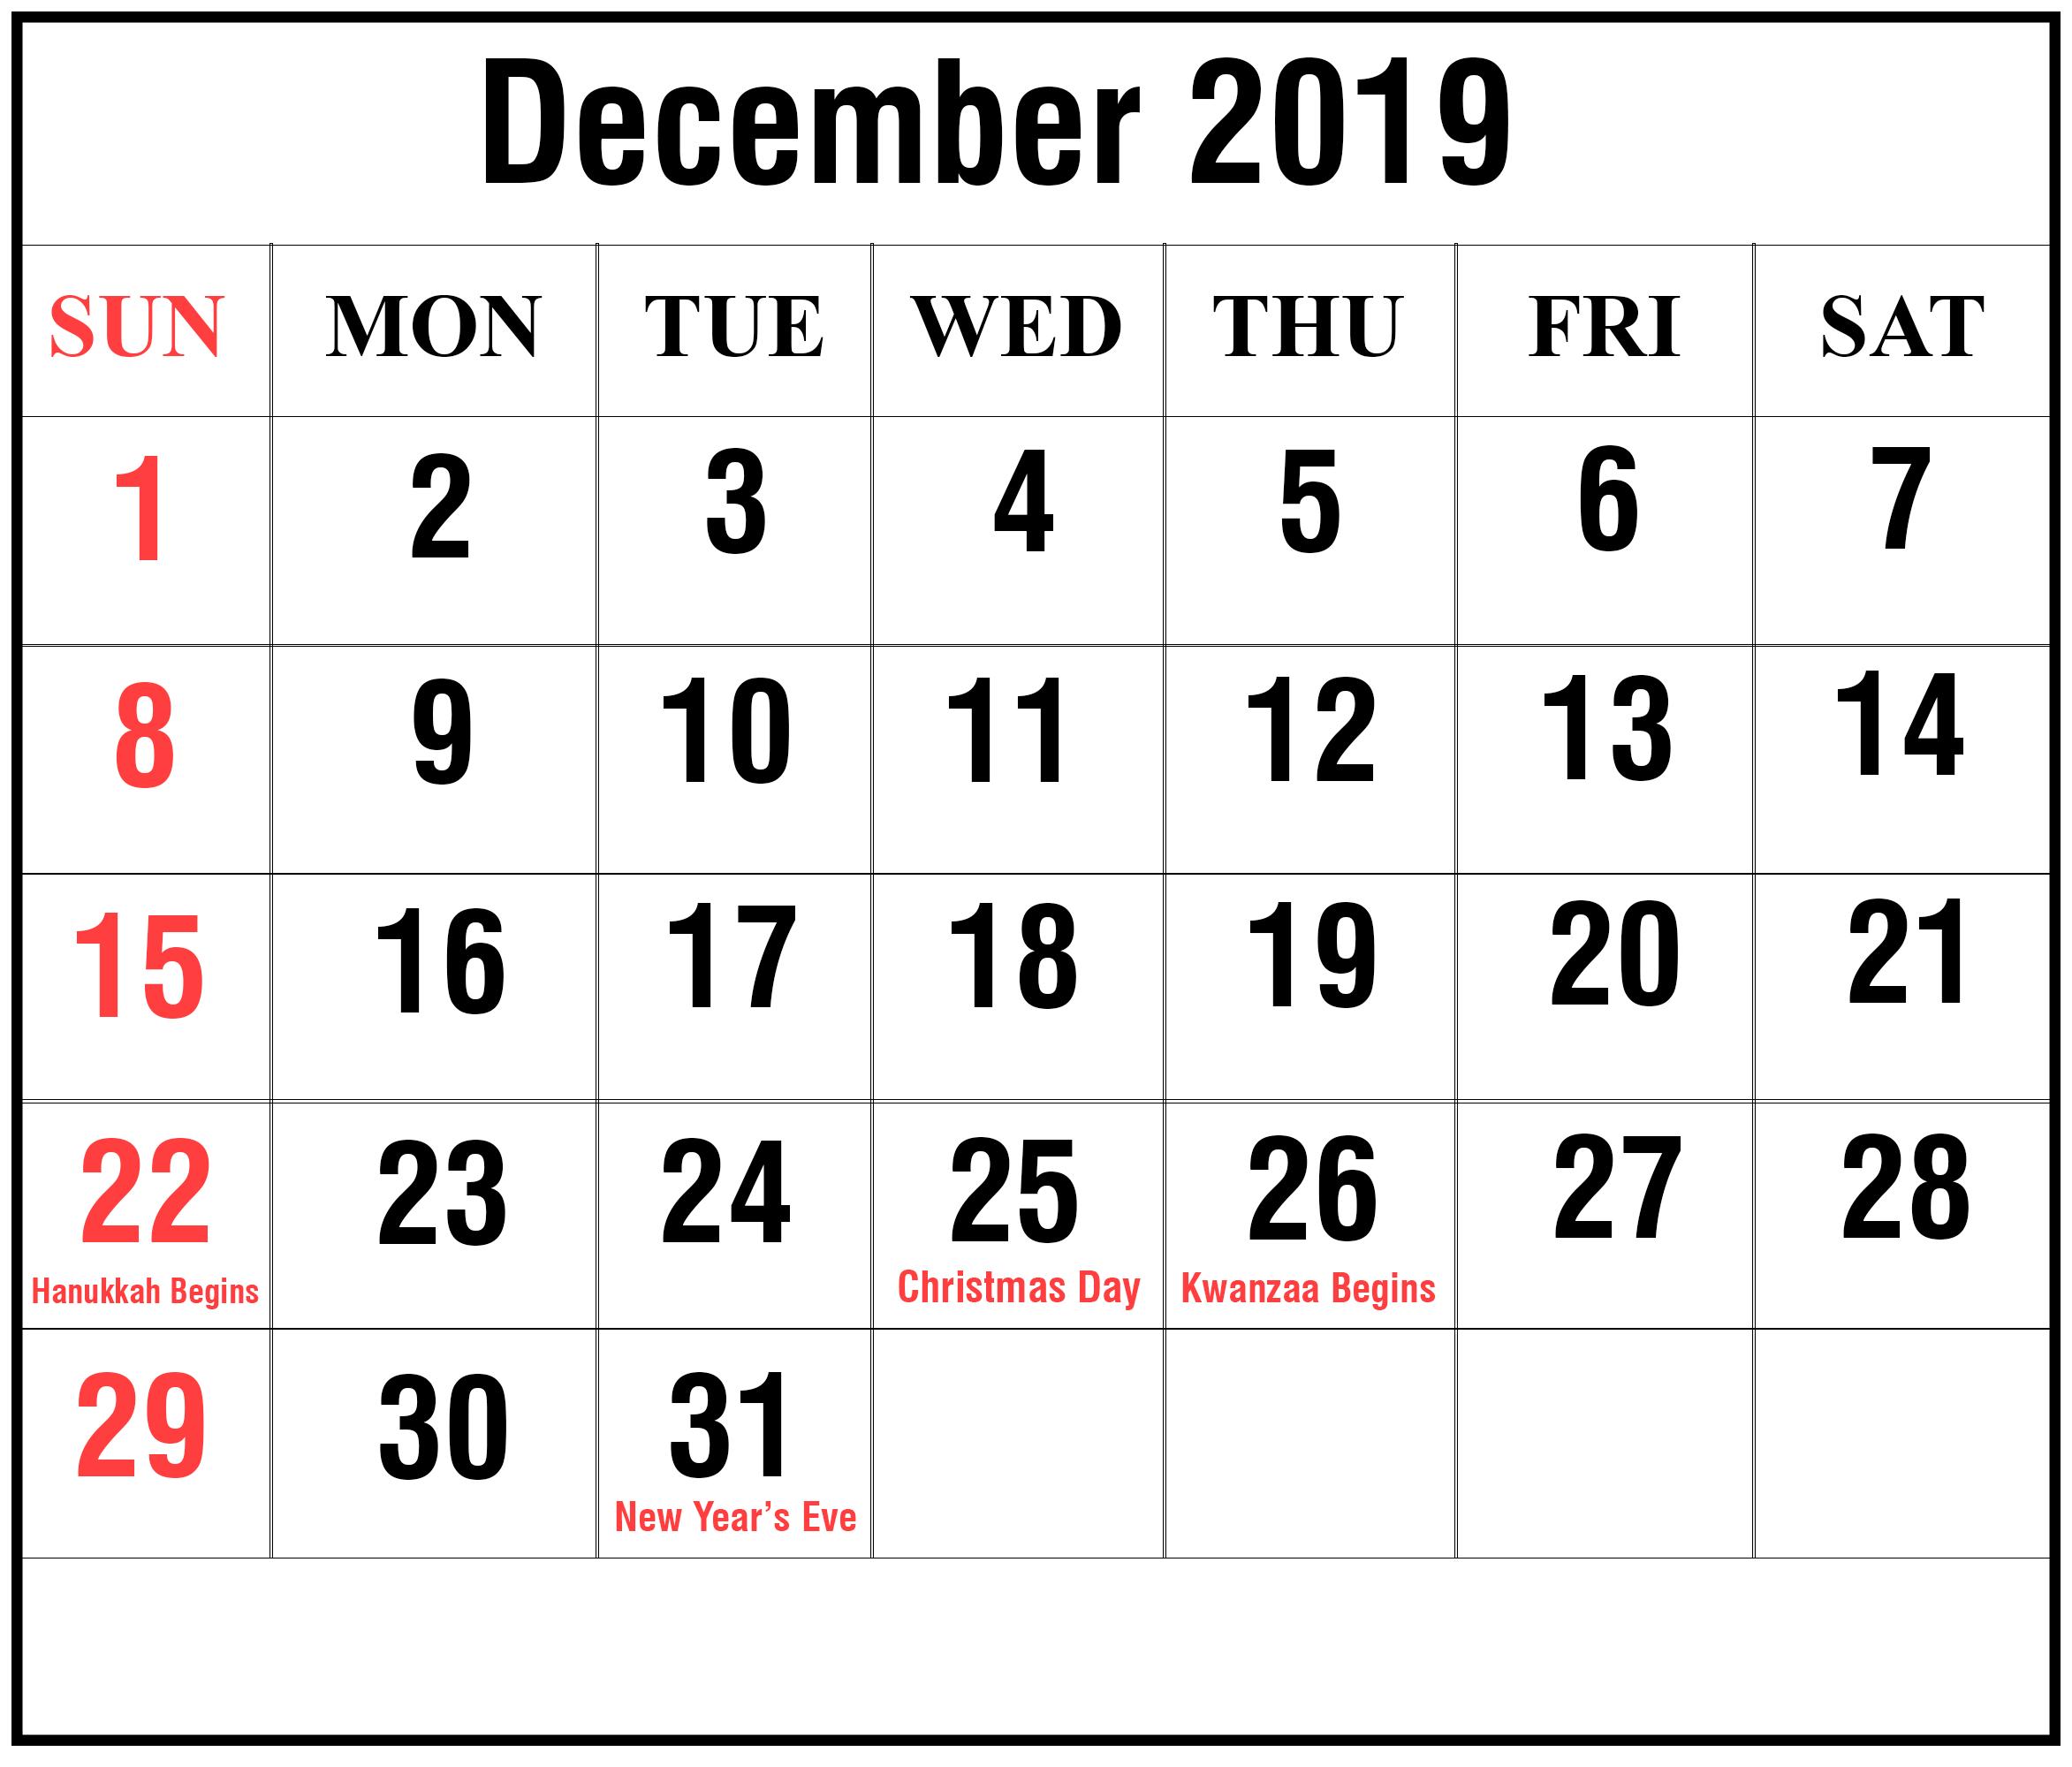 December Calendar 2019 with Holidays